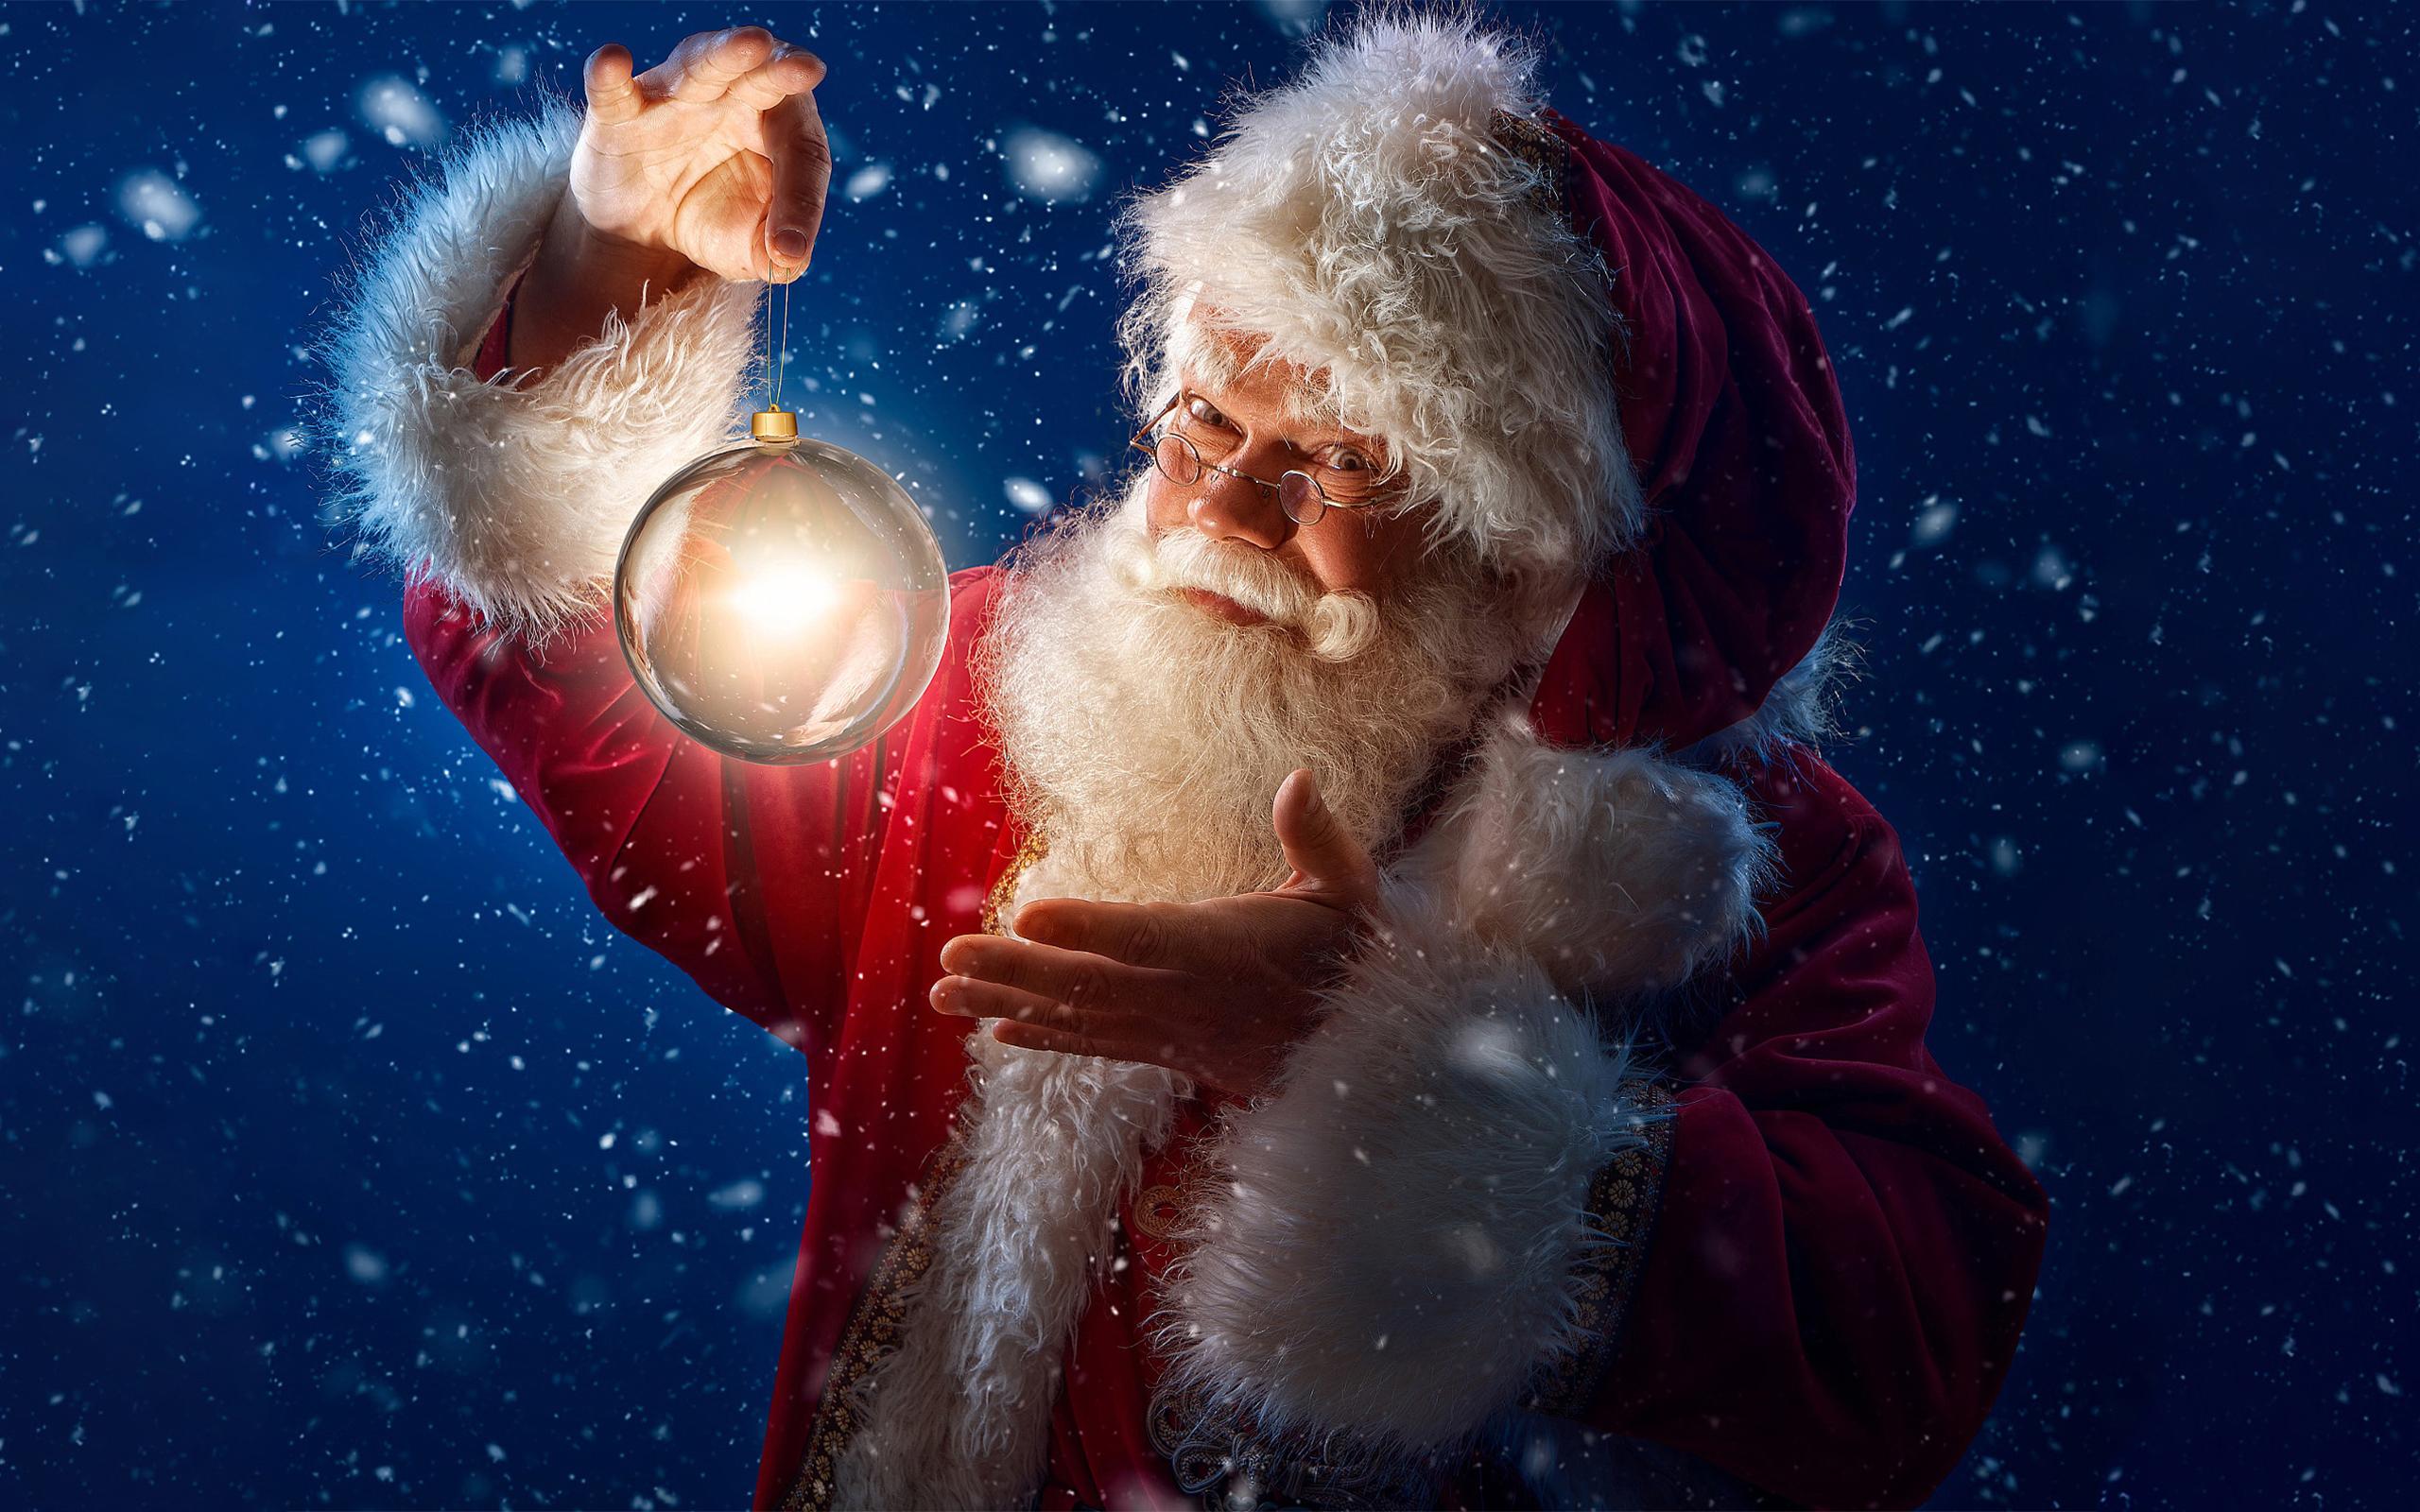 Sfondi Babbo Natale.Sfondi Babbo Natale Vacanza 2560x1600 Italojonathan 1744941 Sfondi Gratis Wallhere